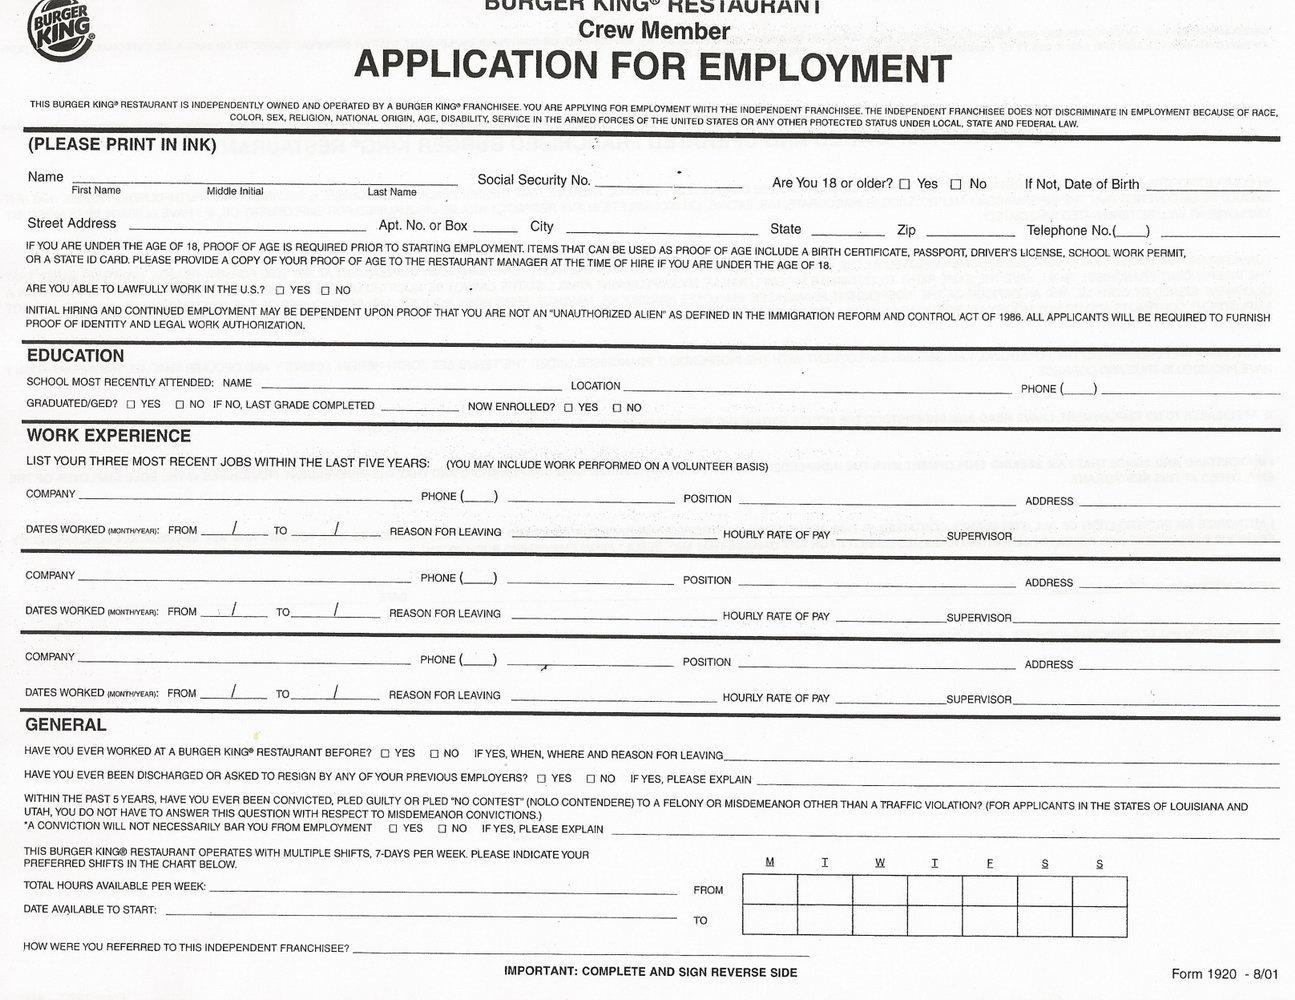 Printable Job Applications For Fast Food Restaurants